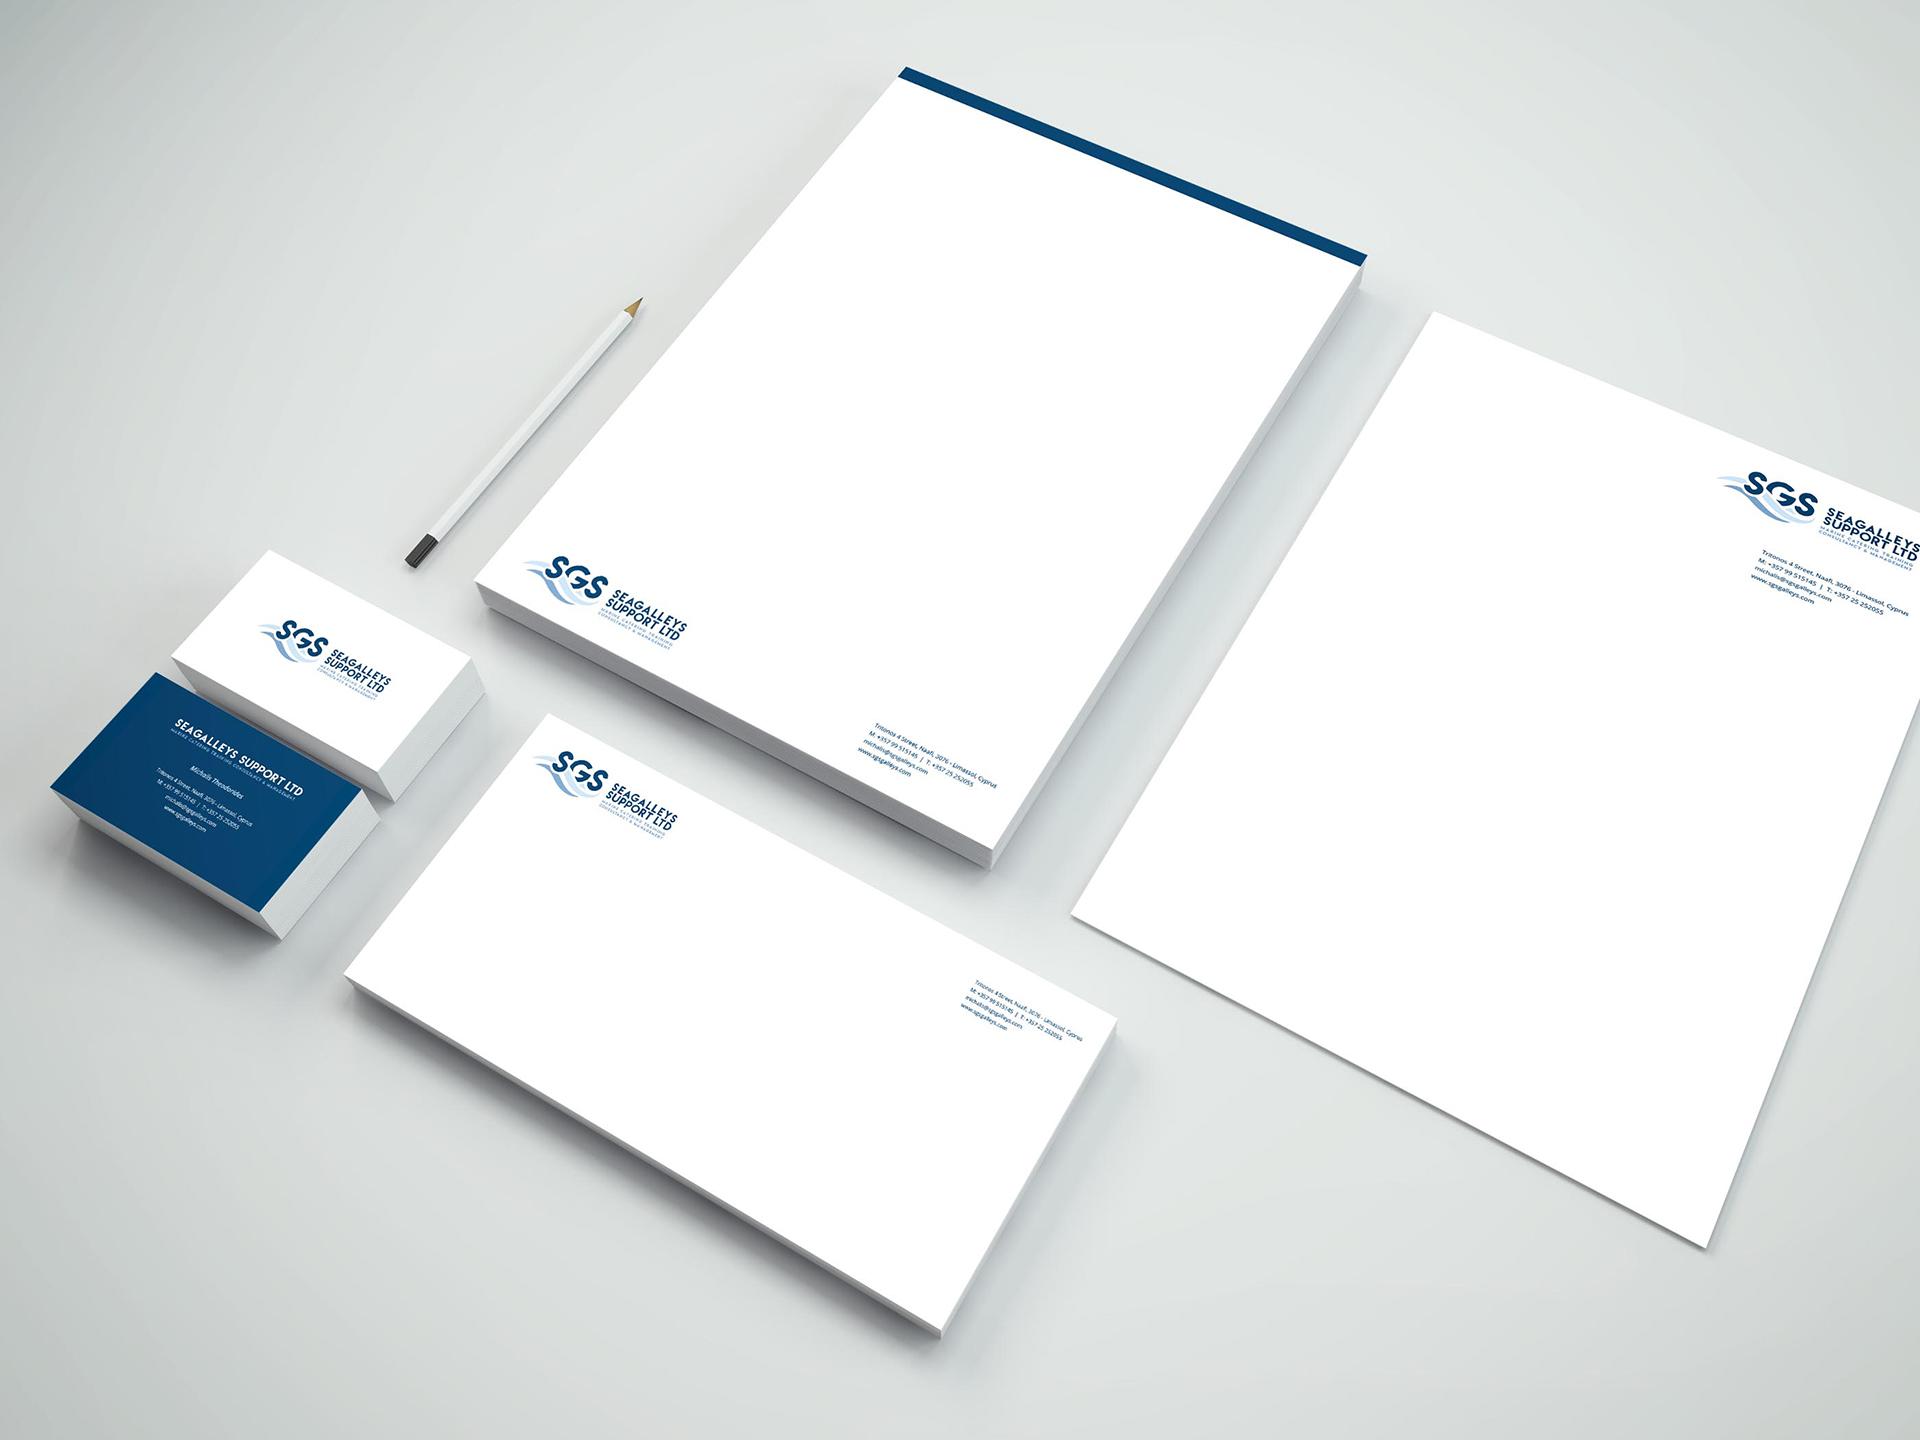 Branding Box: Corporate Identity SGS Galleys